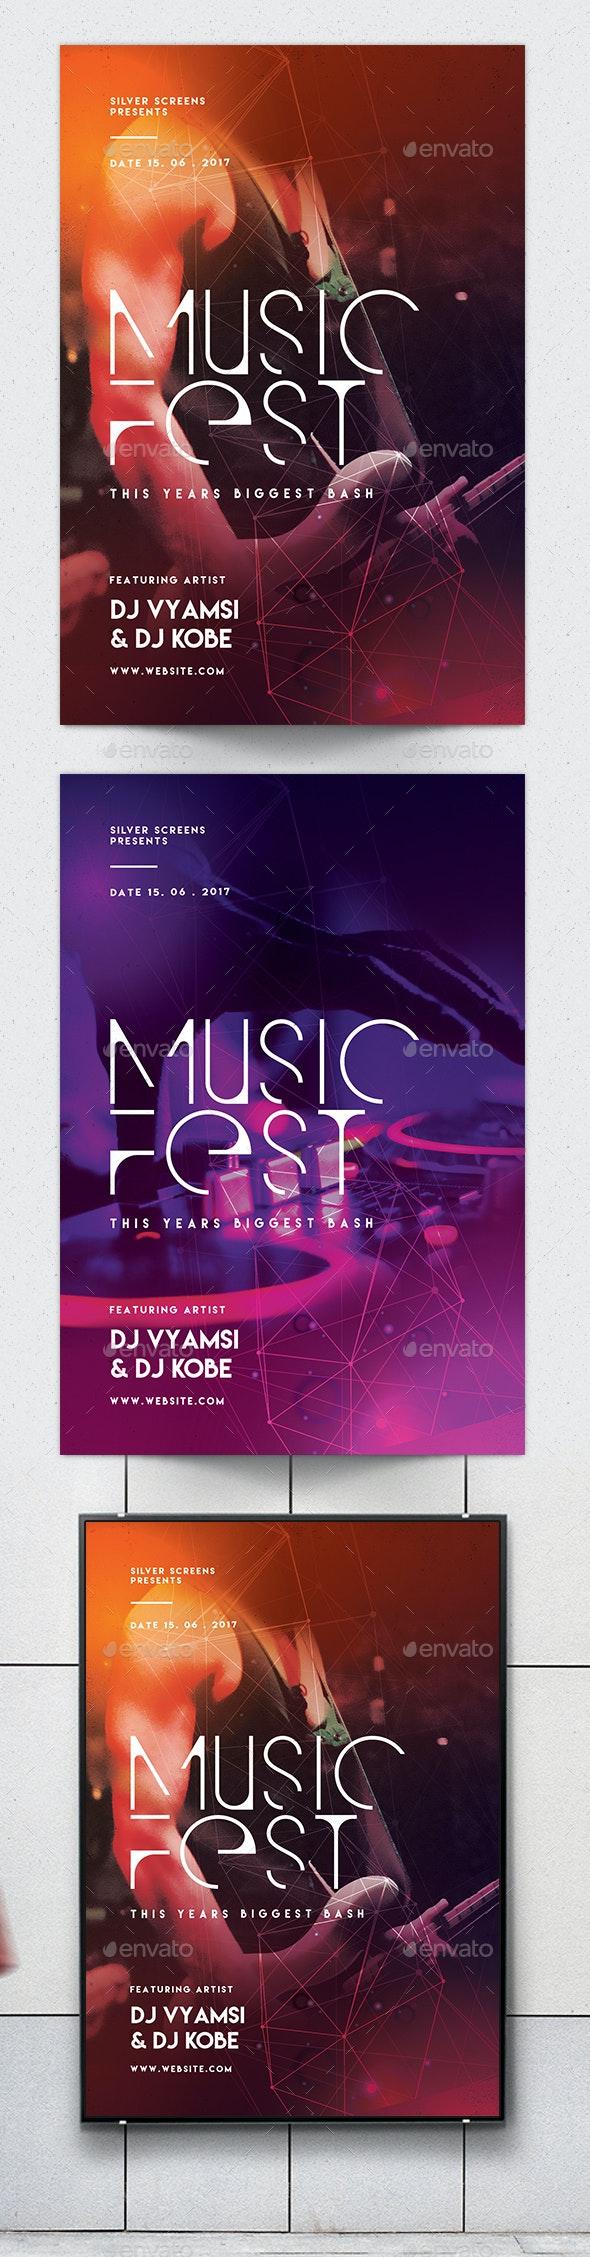 Music Fest Minimal Flyer - Events Flyers